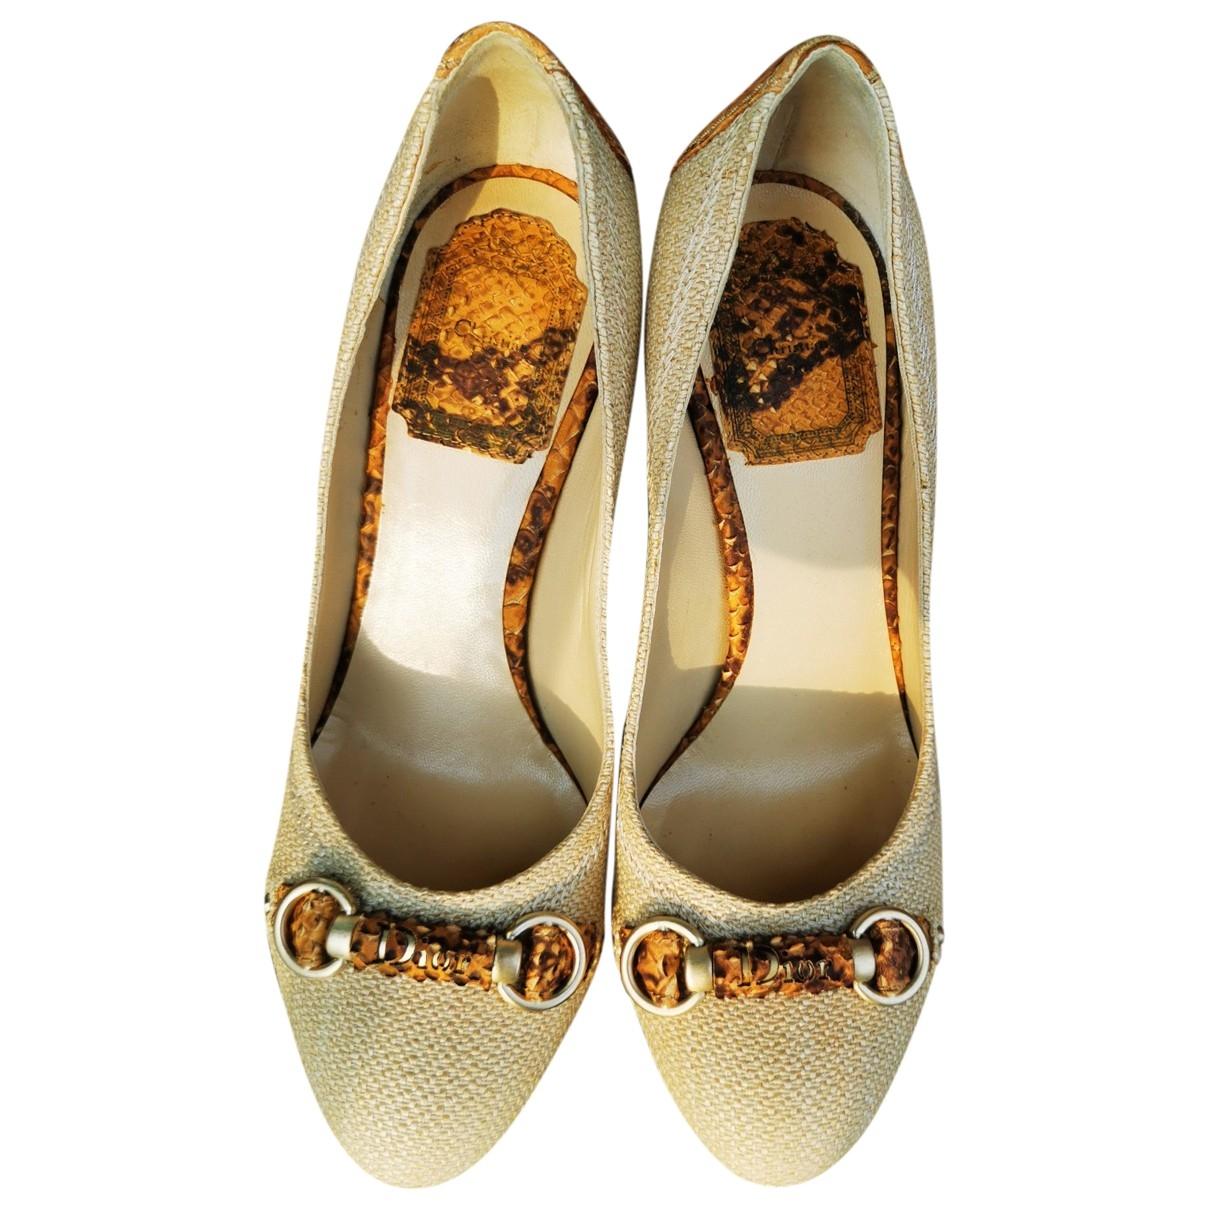 Dior \N Beige Cloth Heels for Women 35.5 EU